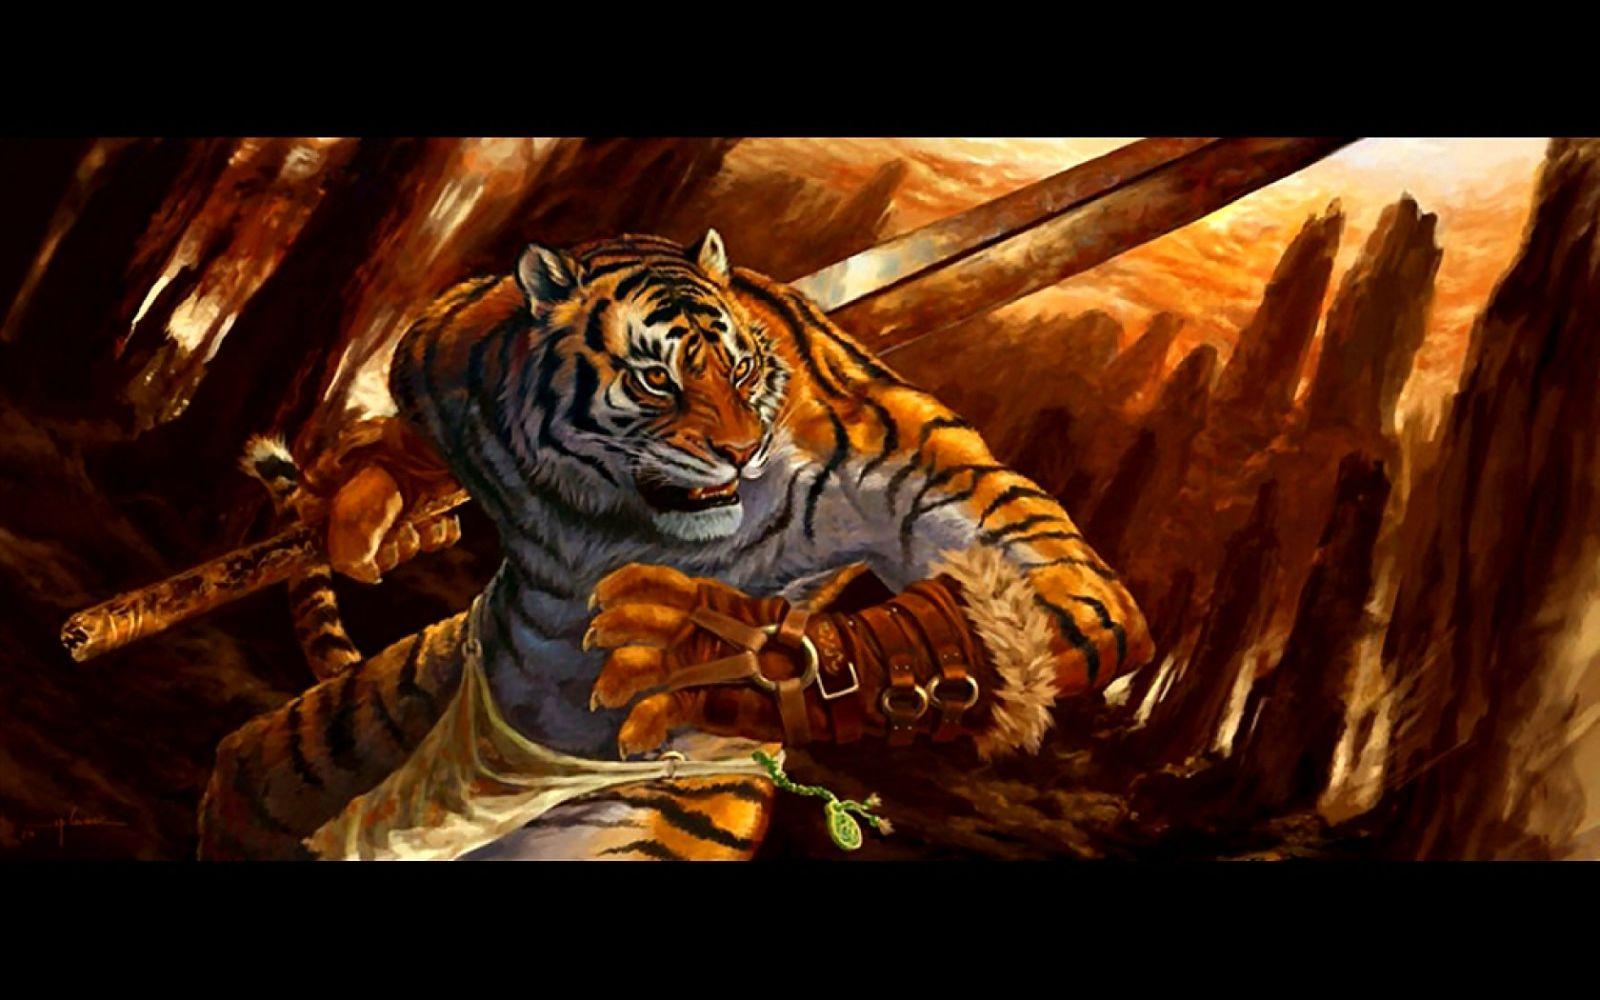 tigers vs warriors - HD1920×1200